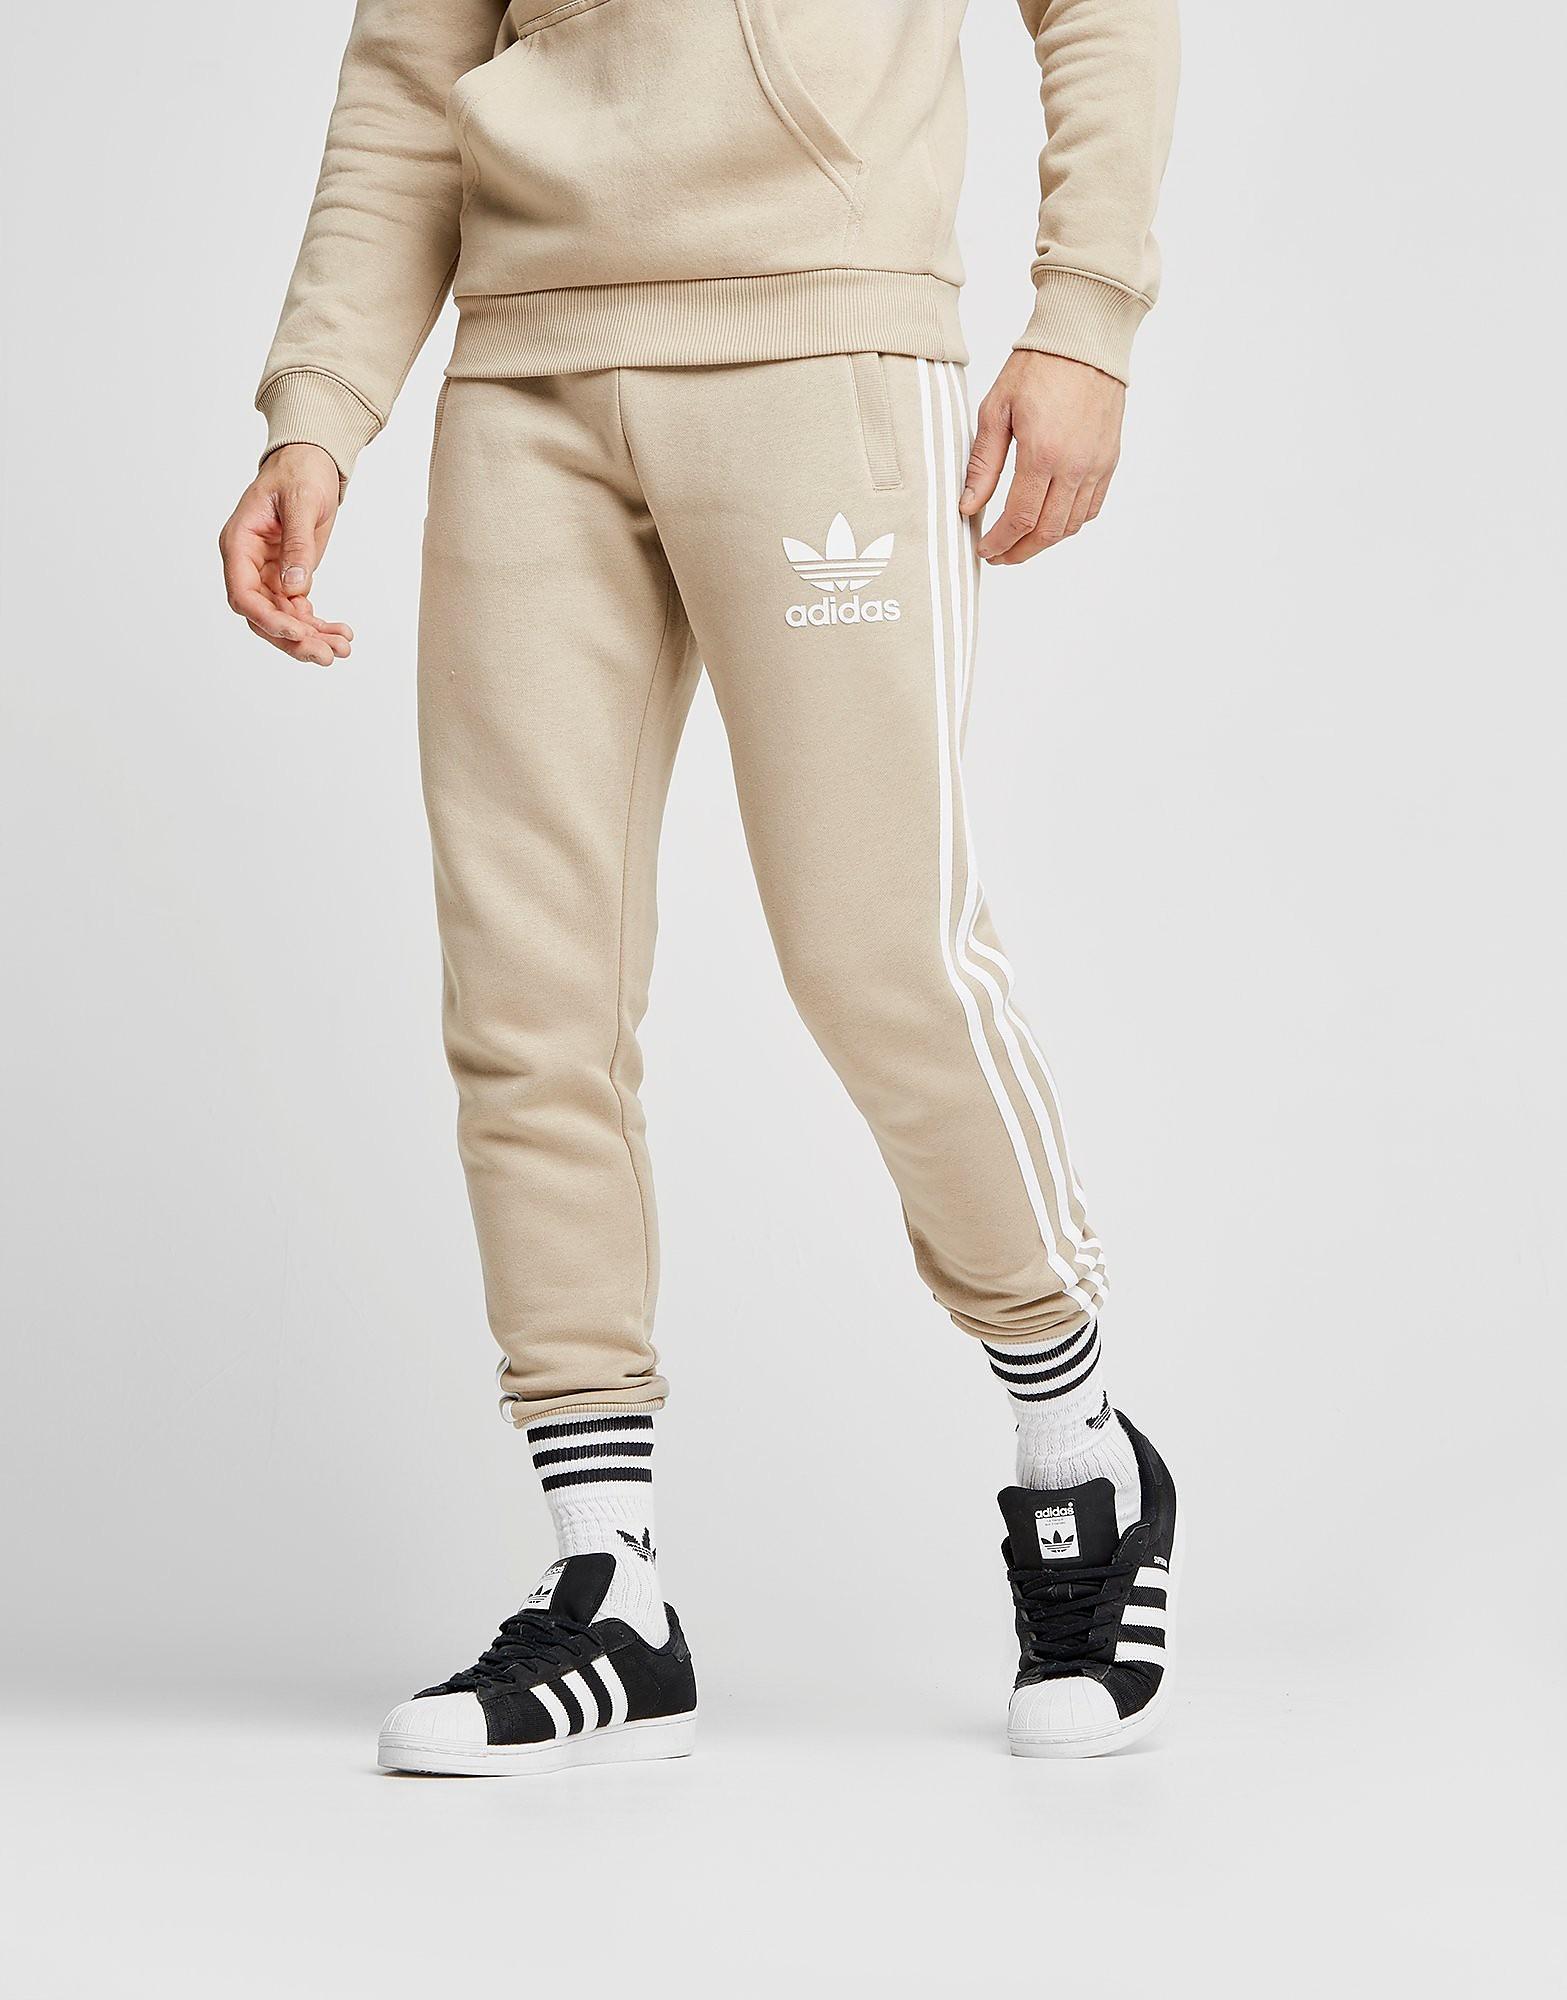 adidas Originals California Cuffed Track Pants